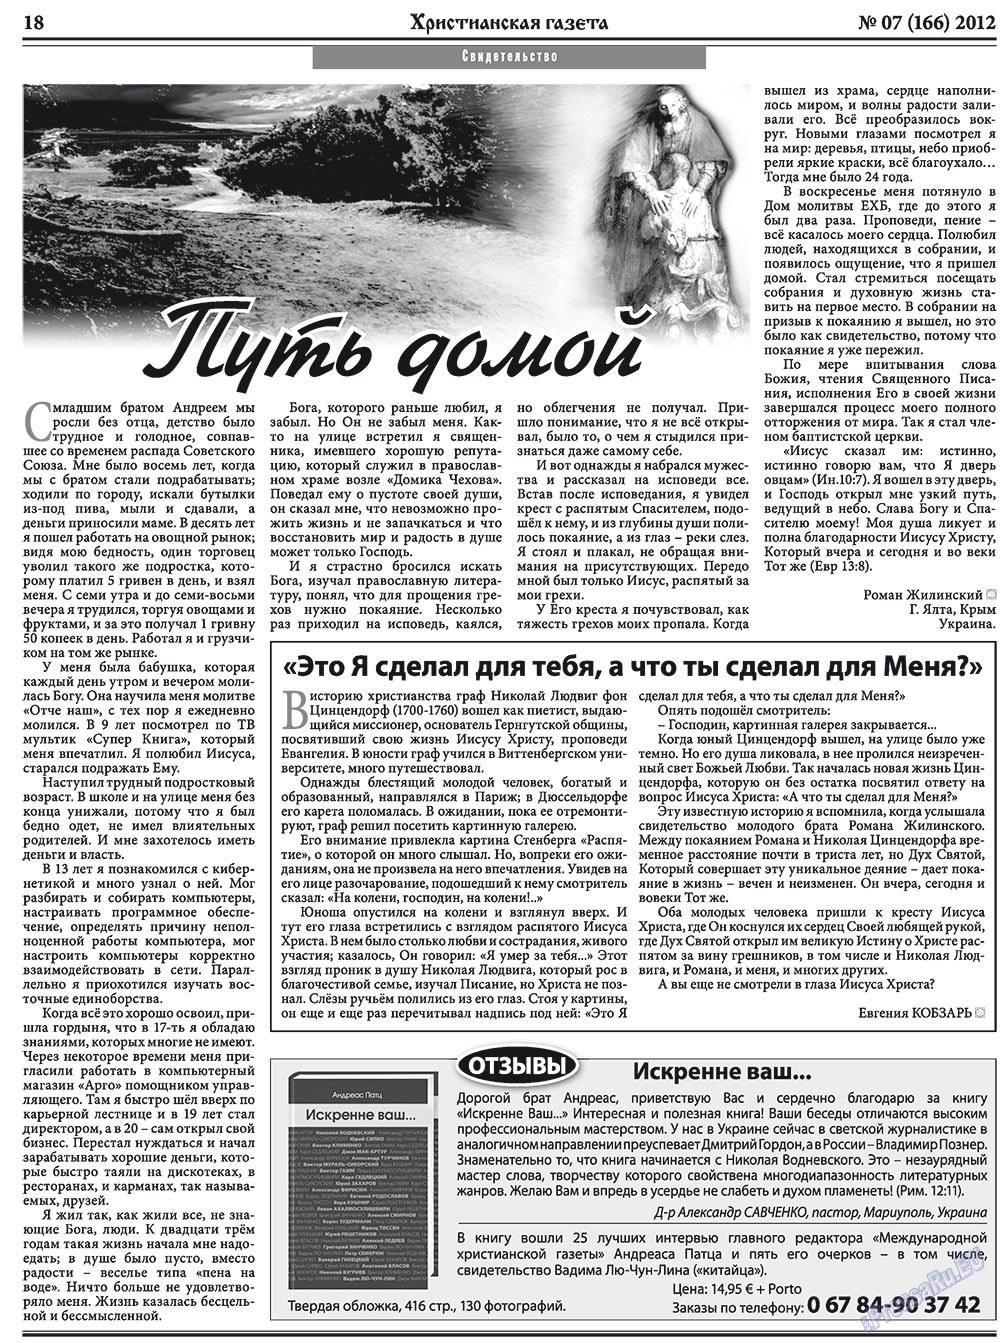 Газета 7 я найти знакомства